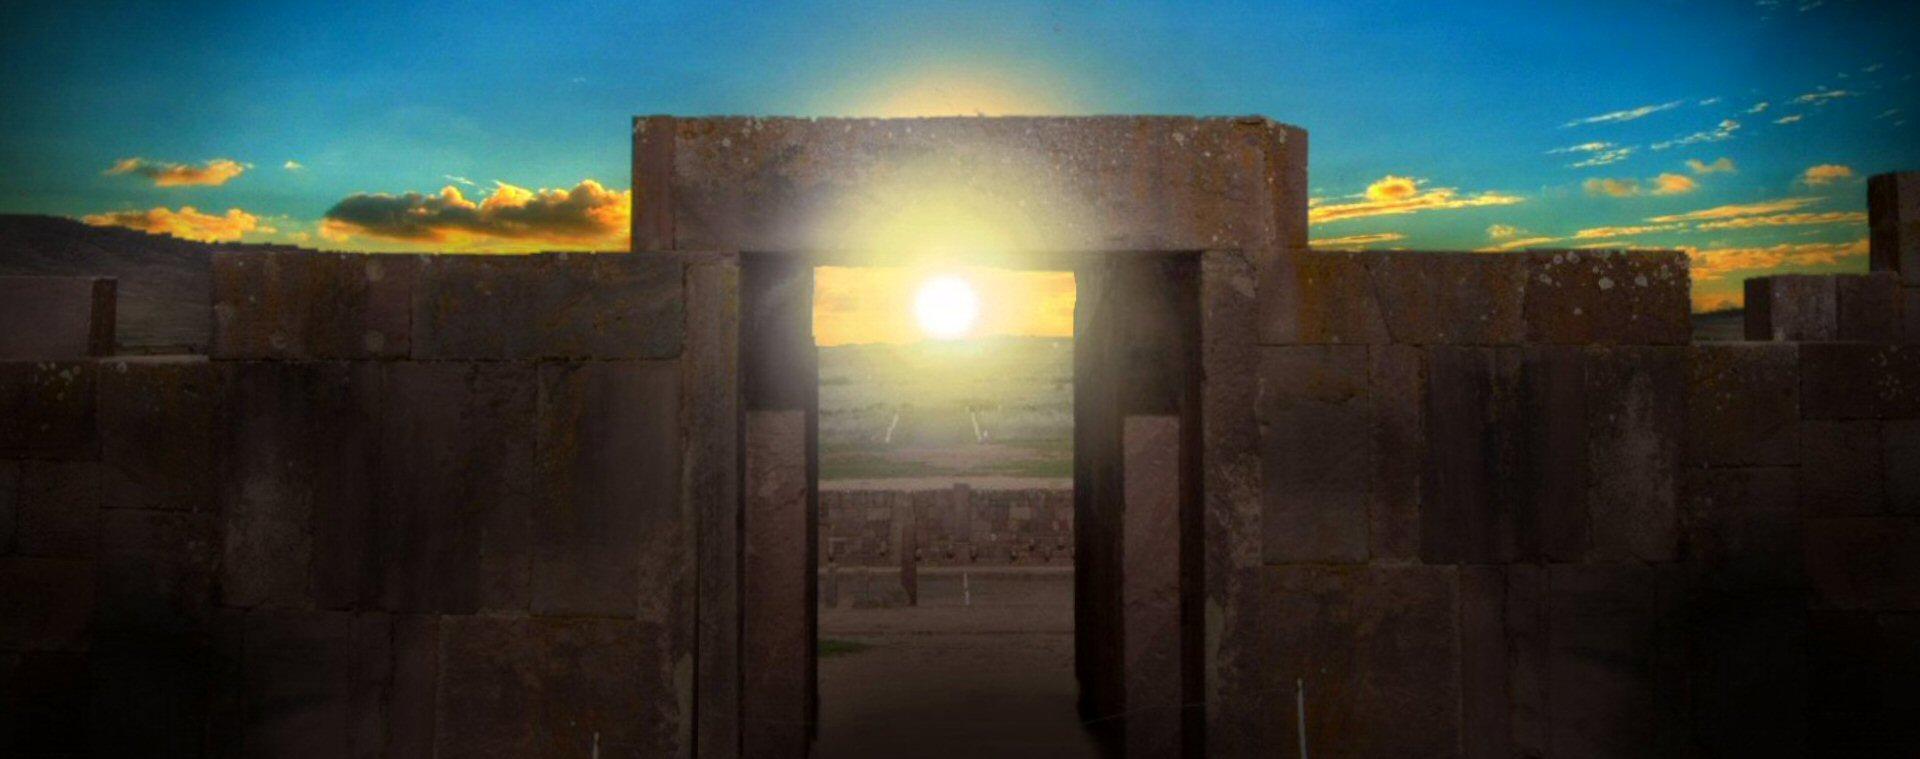 73-archeoastronomia_slid2